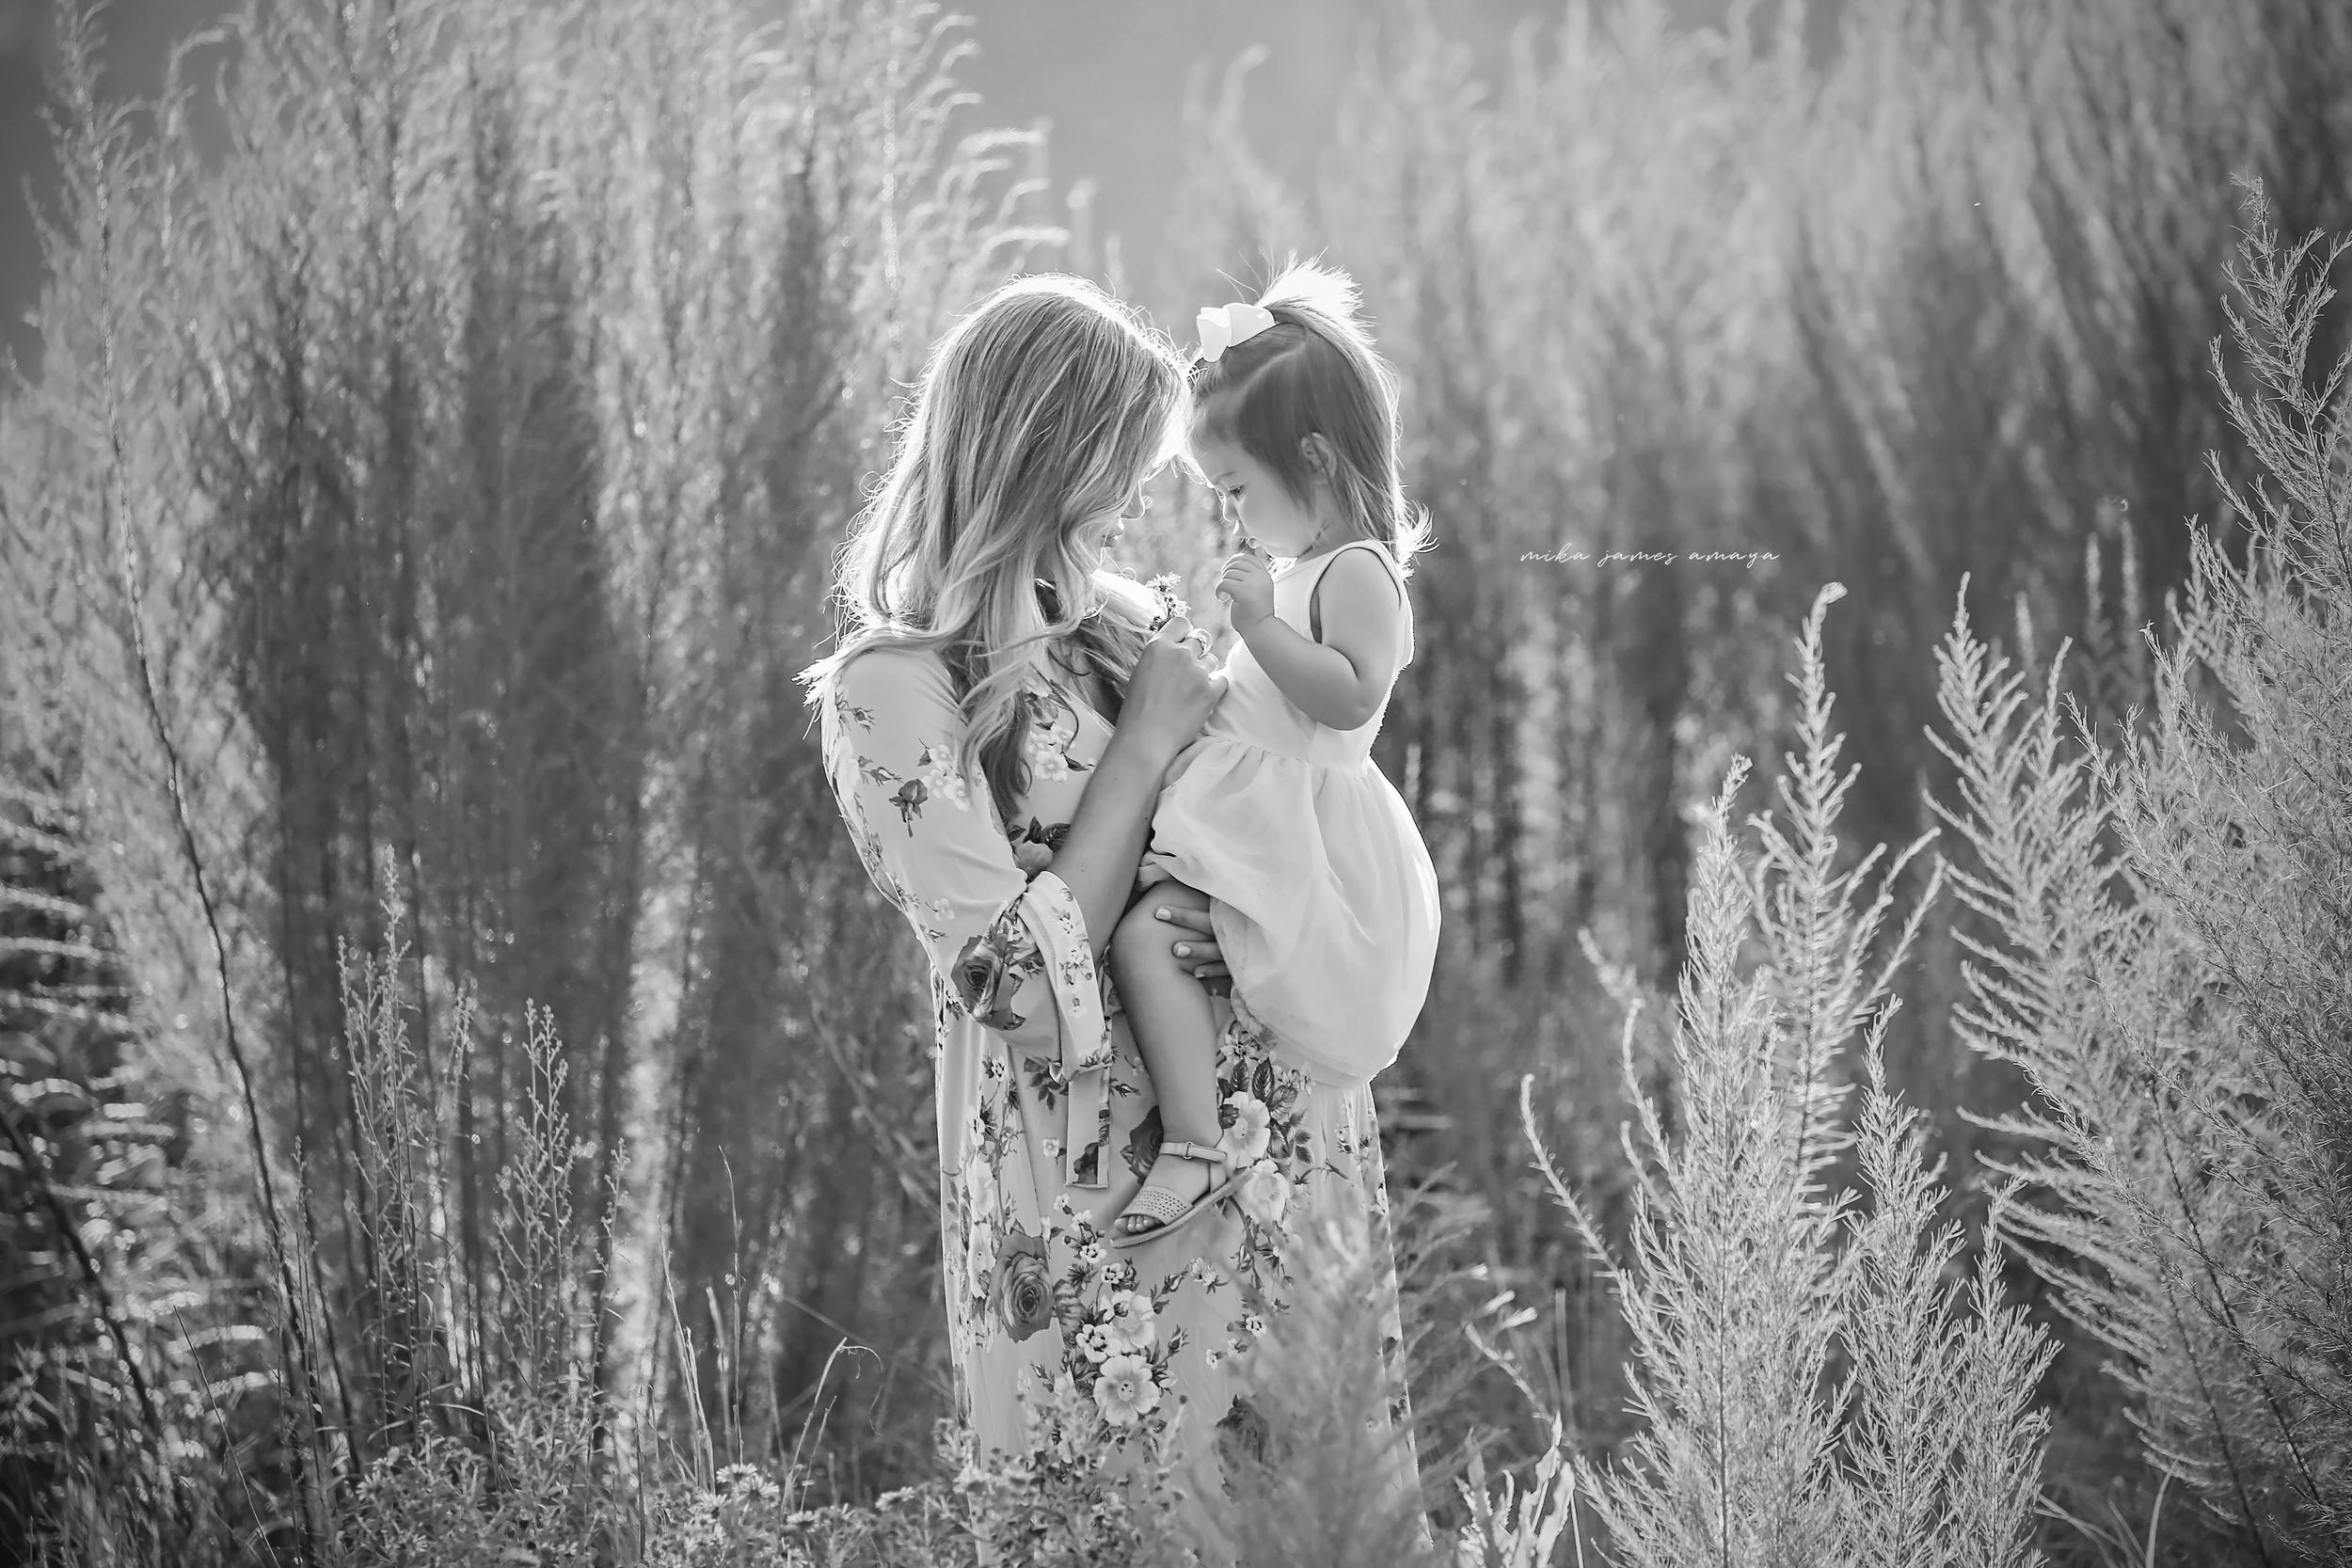 best+raleigh+nc+newborn+photographer+_mika+james+amaya+photography+_+raleigh+nc+maternity+photographer+_+raleigh+nc+family+photographer+_+raleigh+nc+photography+studio+_+raleigh+nc+outdoor+maternity+photographer_ kirstin_(5)